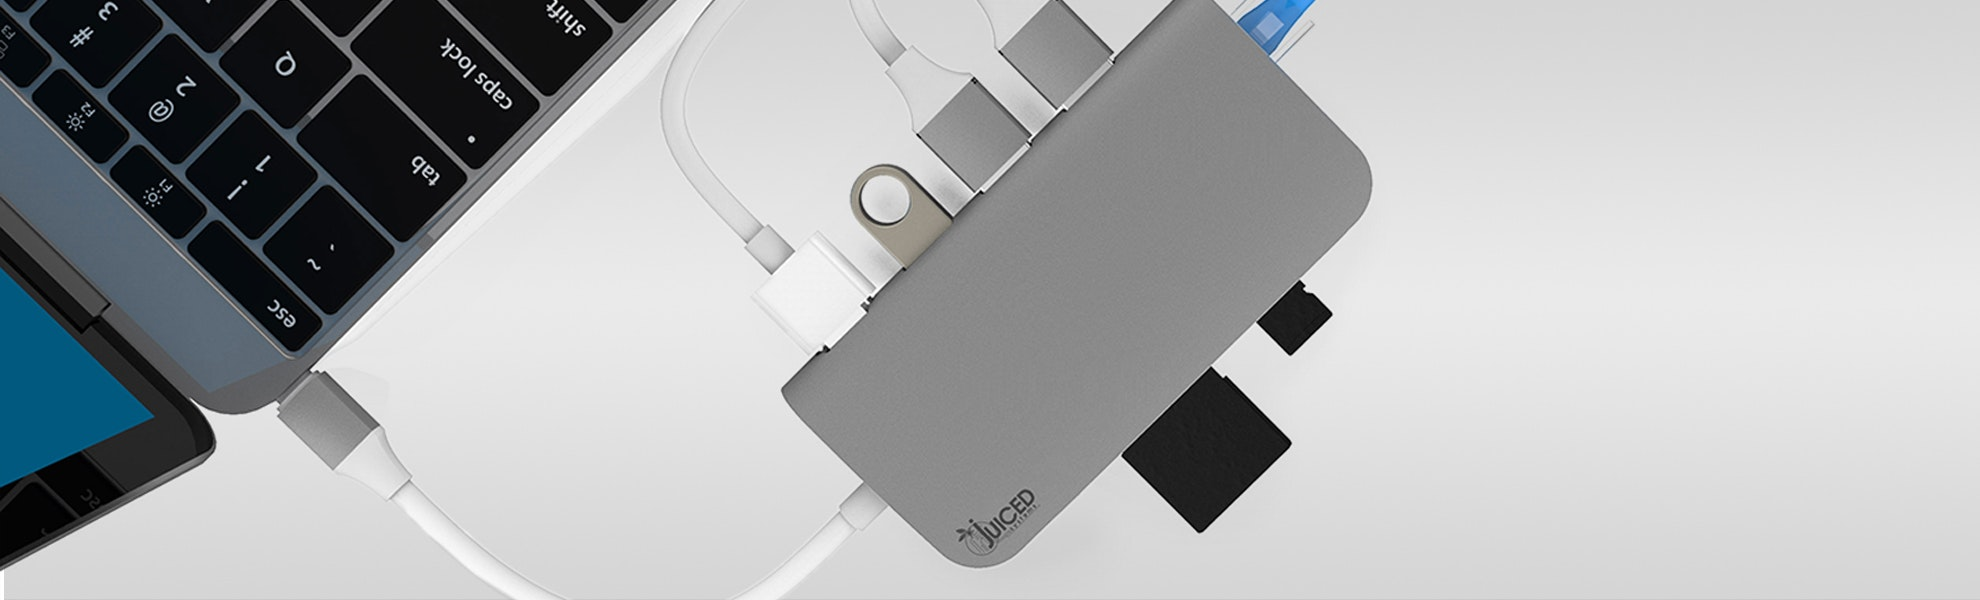 Juiced USB-C MultiPort Gigabit HDMI Hub